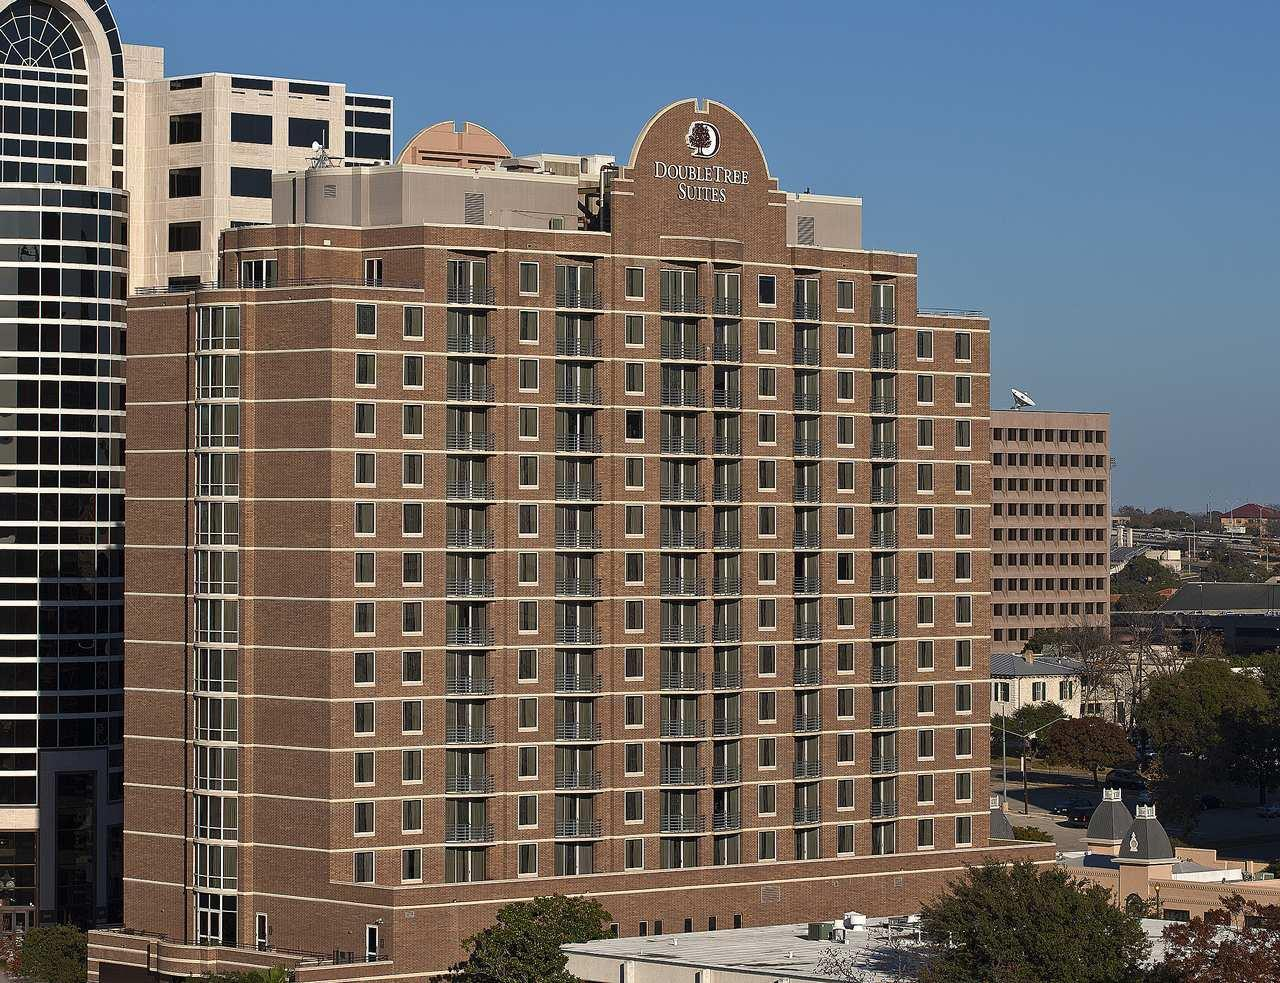 Doubletree Hotel Austin Texas Downtown